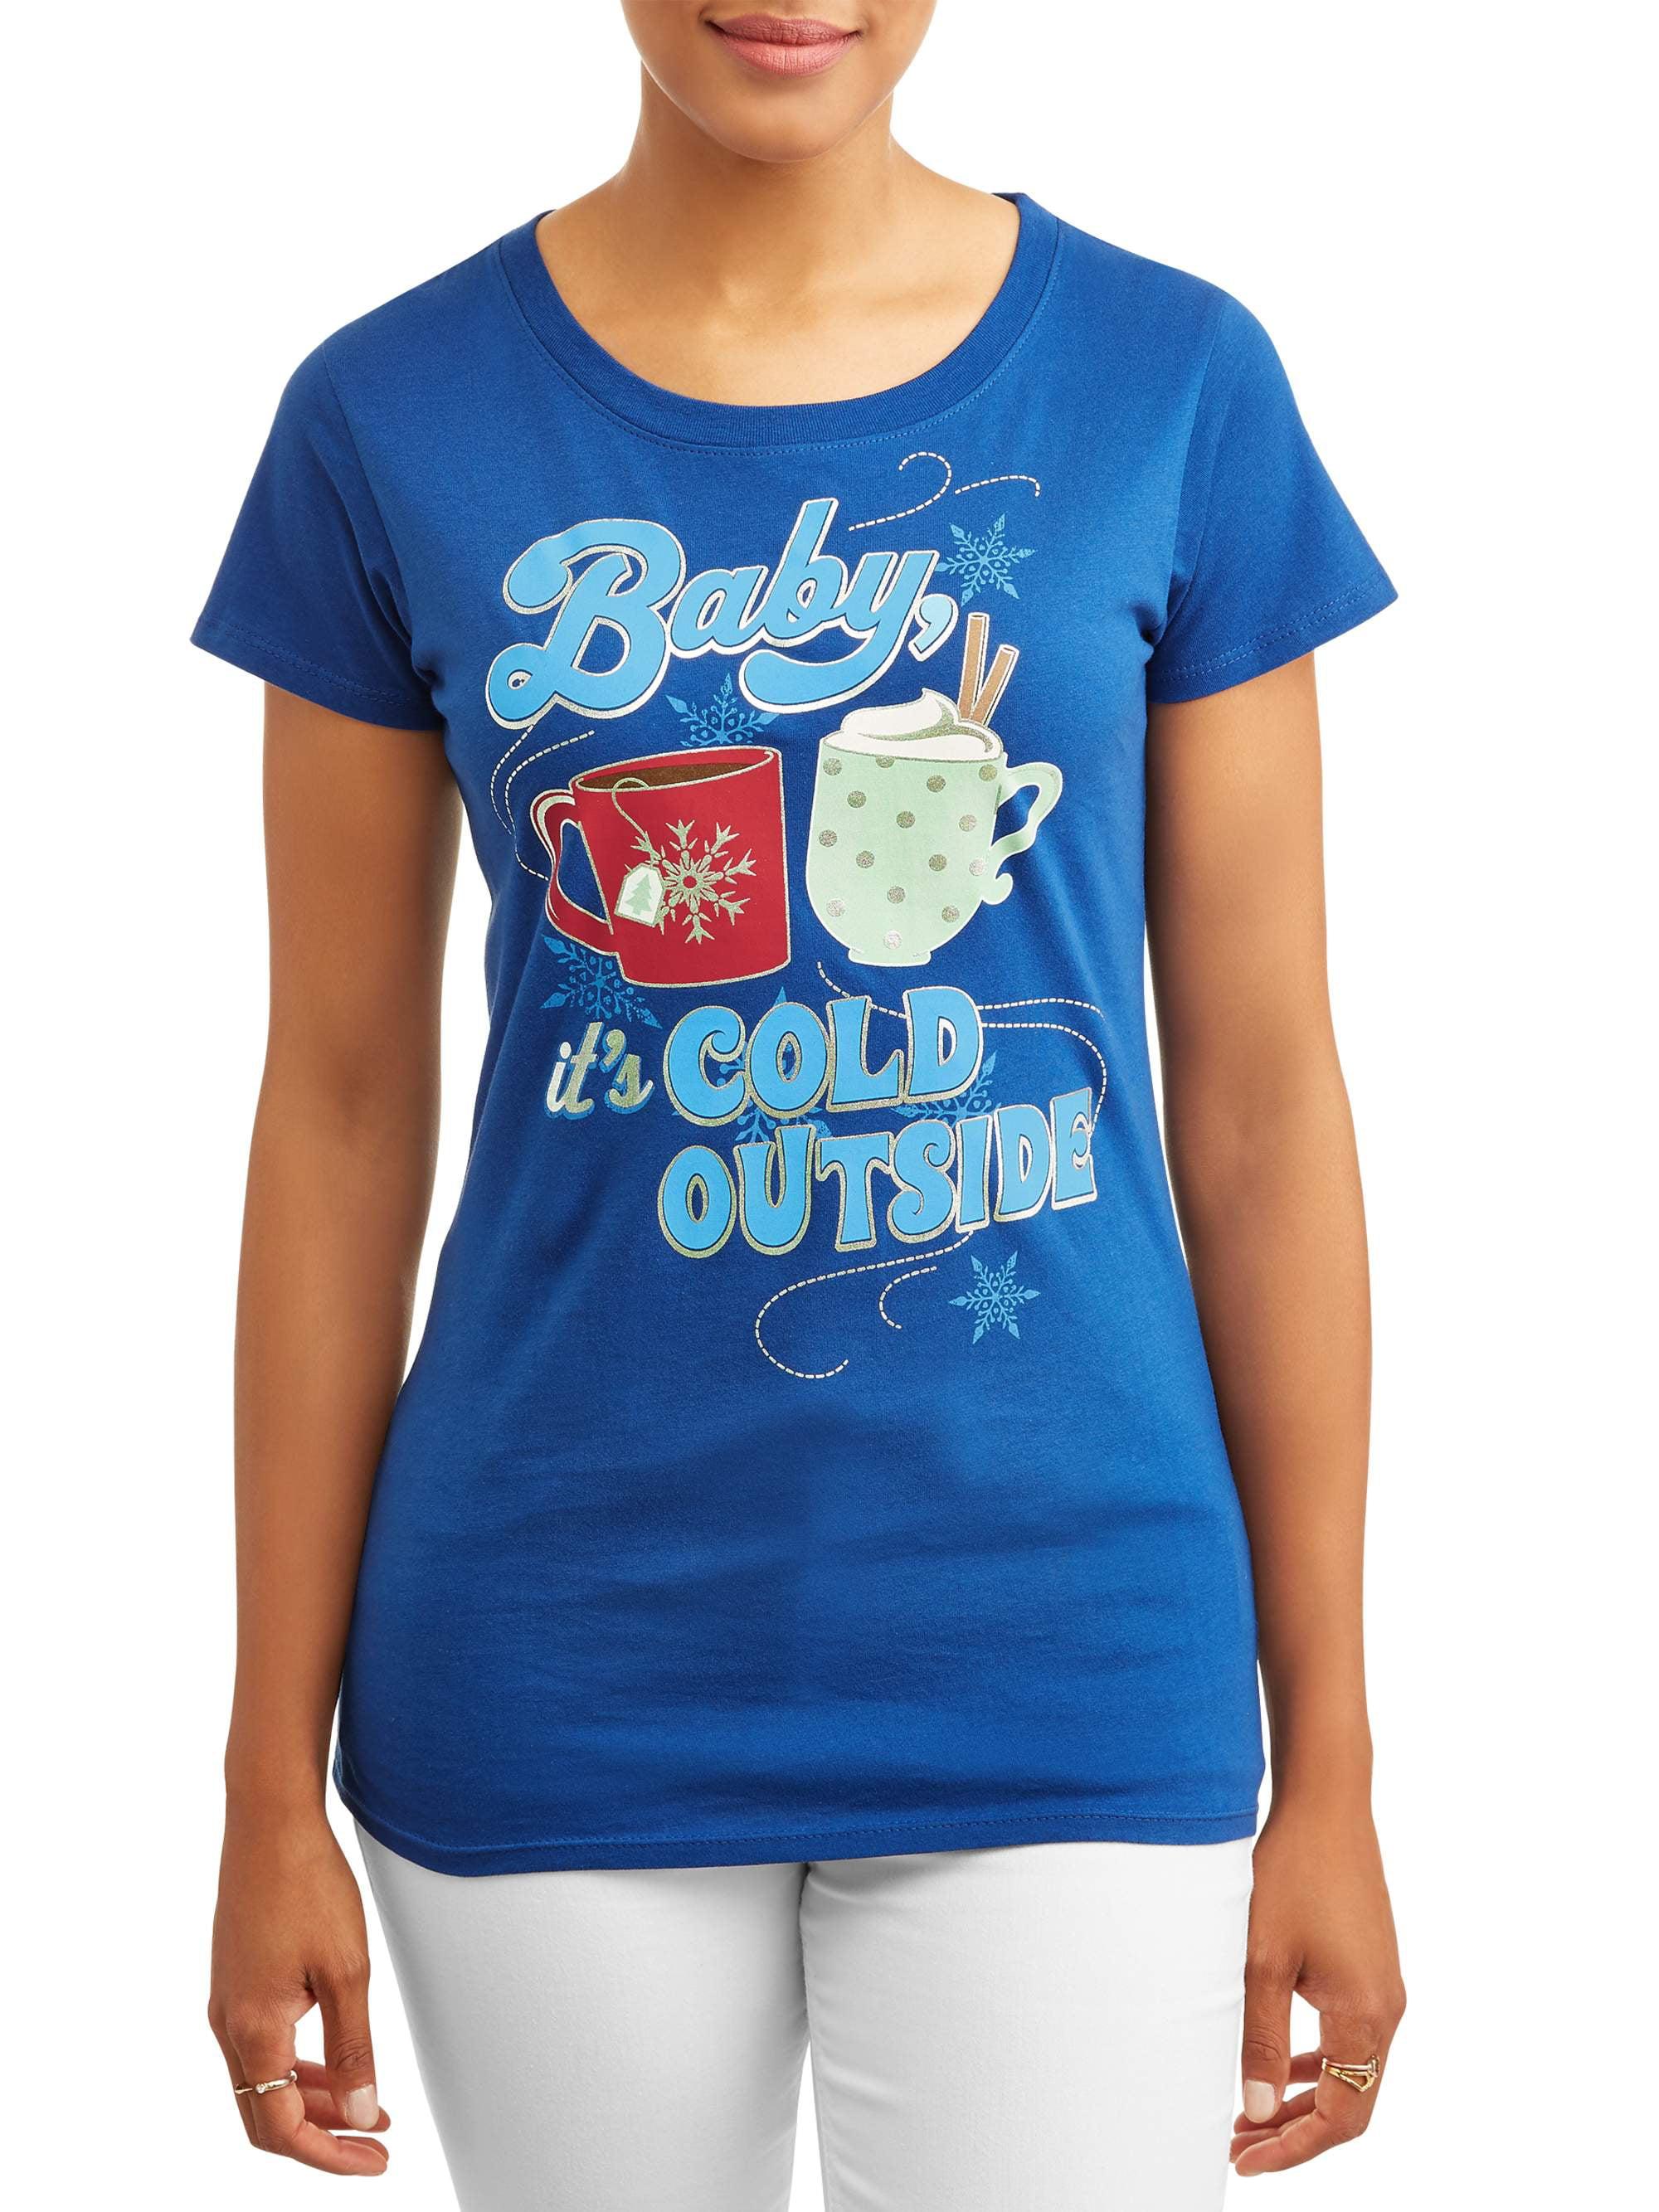 ed28e46b8e12a Mens Fruit Of The Loom T Shirts Walmart | Azərbaycan Dillər Universiteti